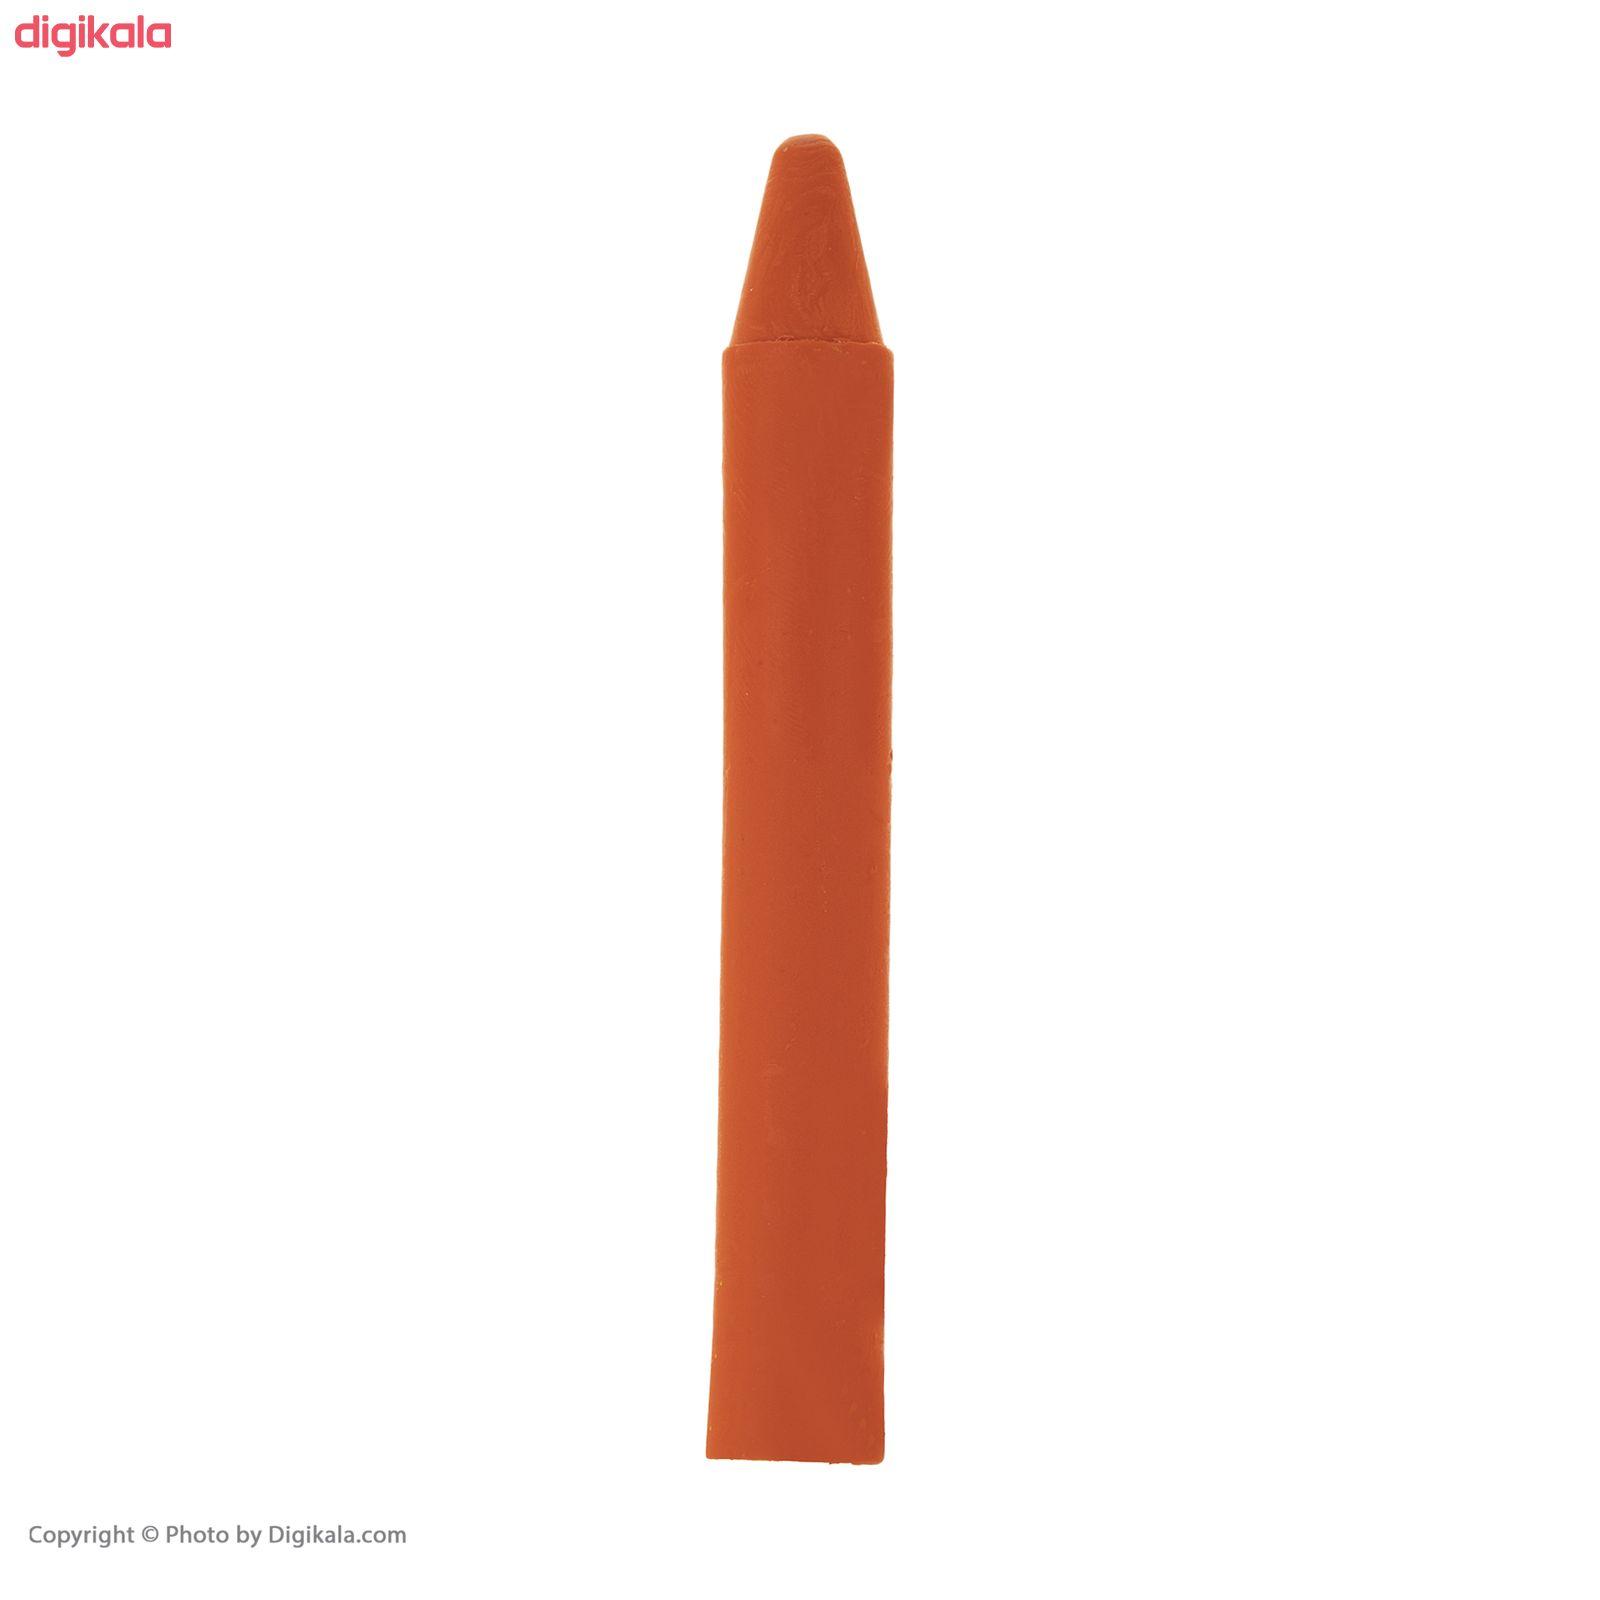 مداد شمعی 8 رنگ اریک کراوزه مدل EK33113 main 1 5